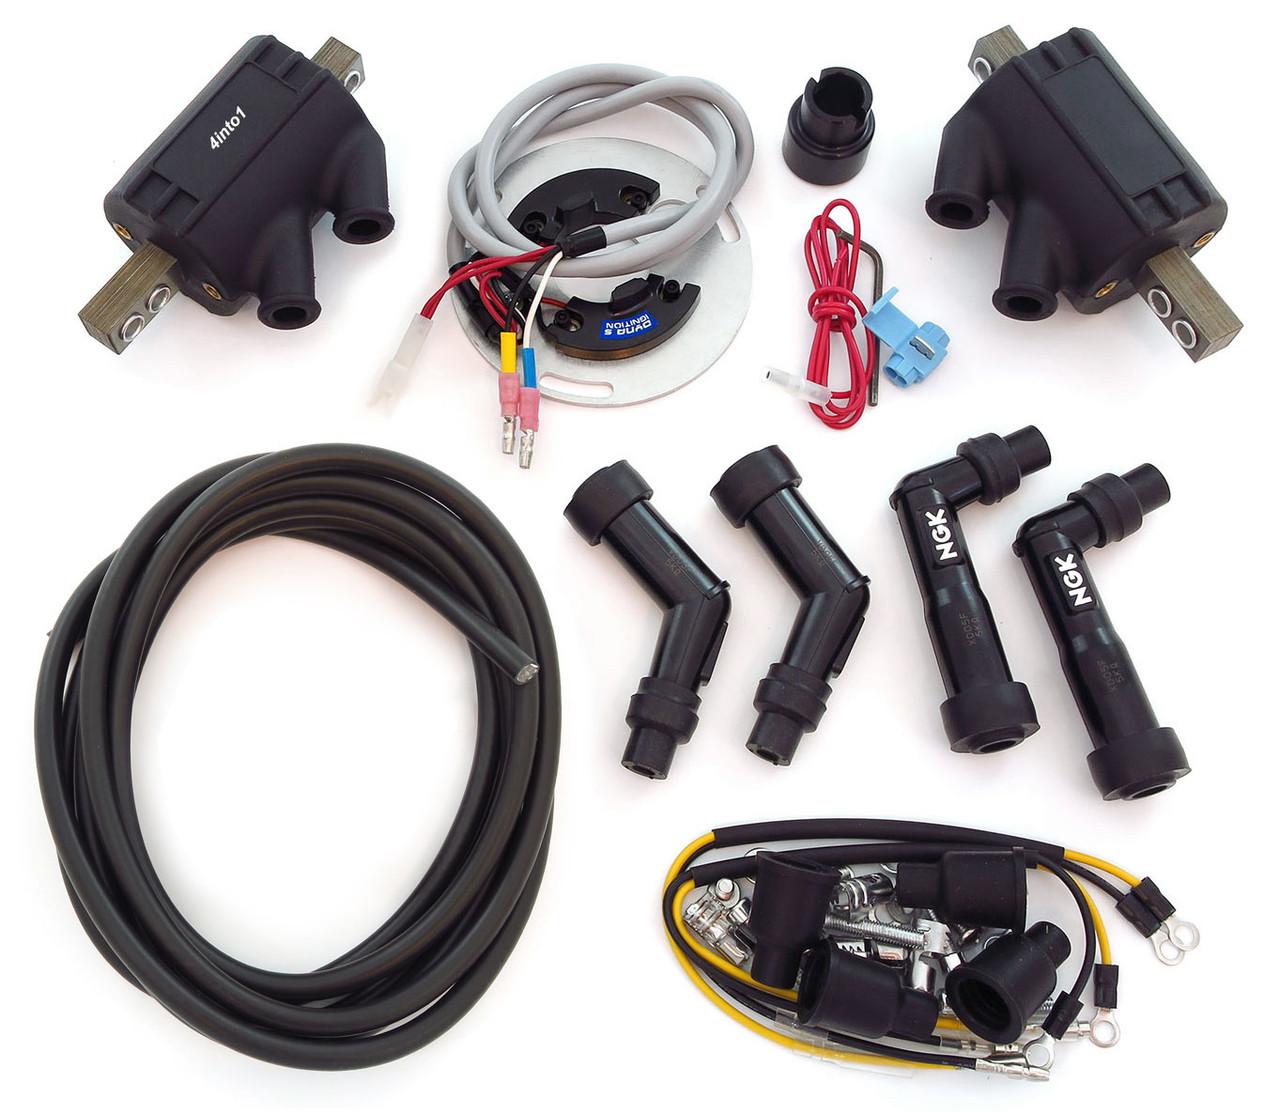 cb500 coil wiring wiring diagram info cb500 coil wiring wiring diagram repair guides cb500 coil wiring